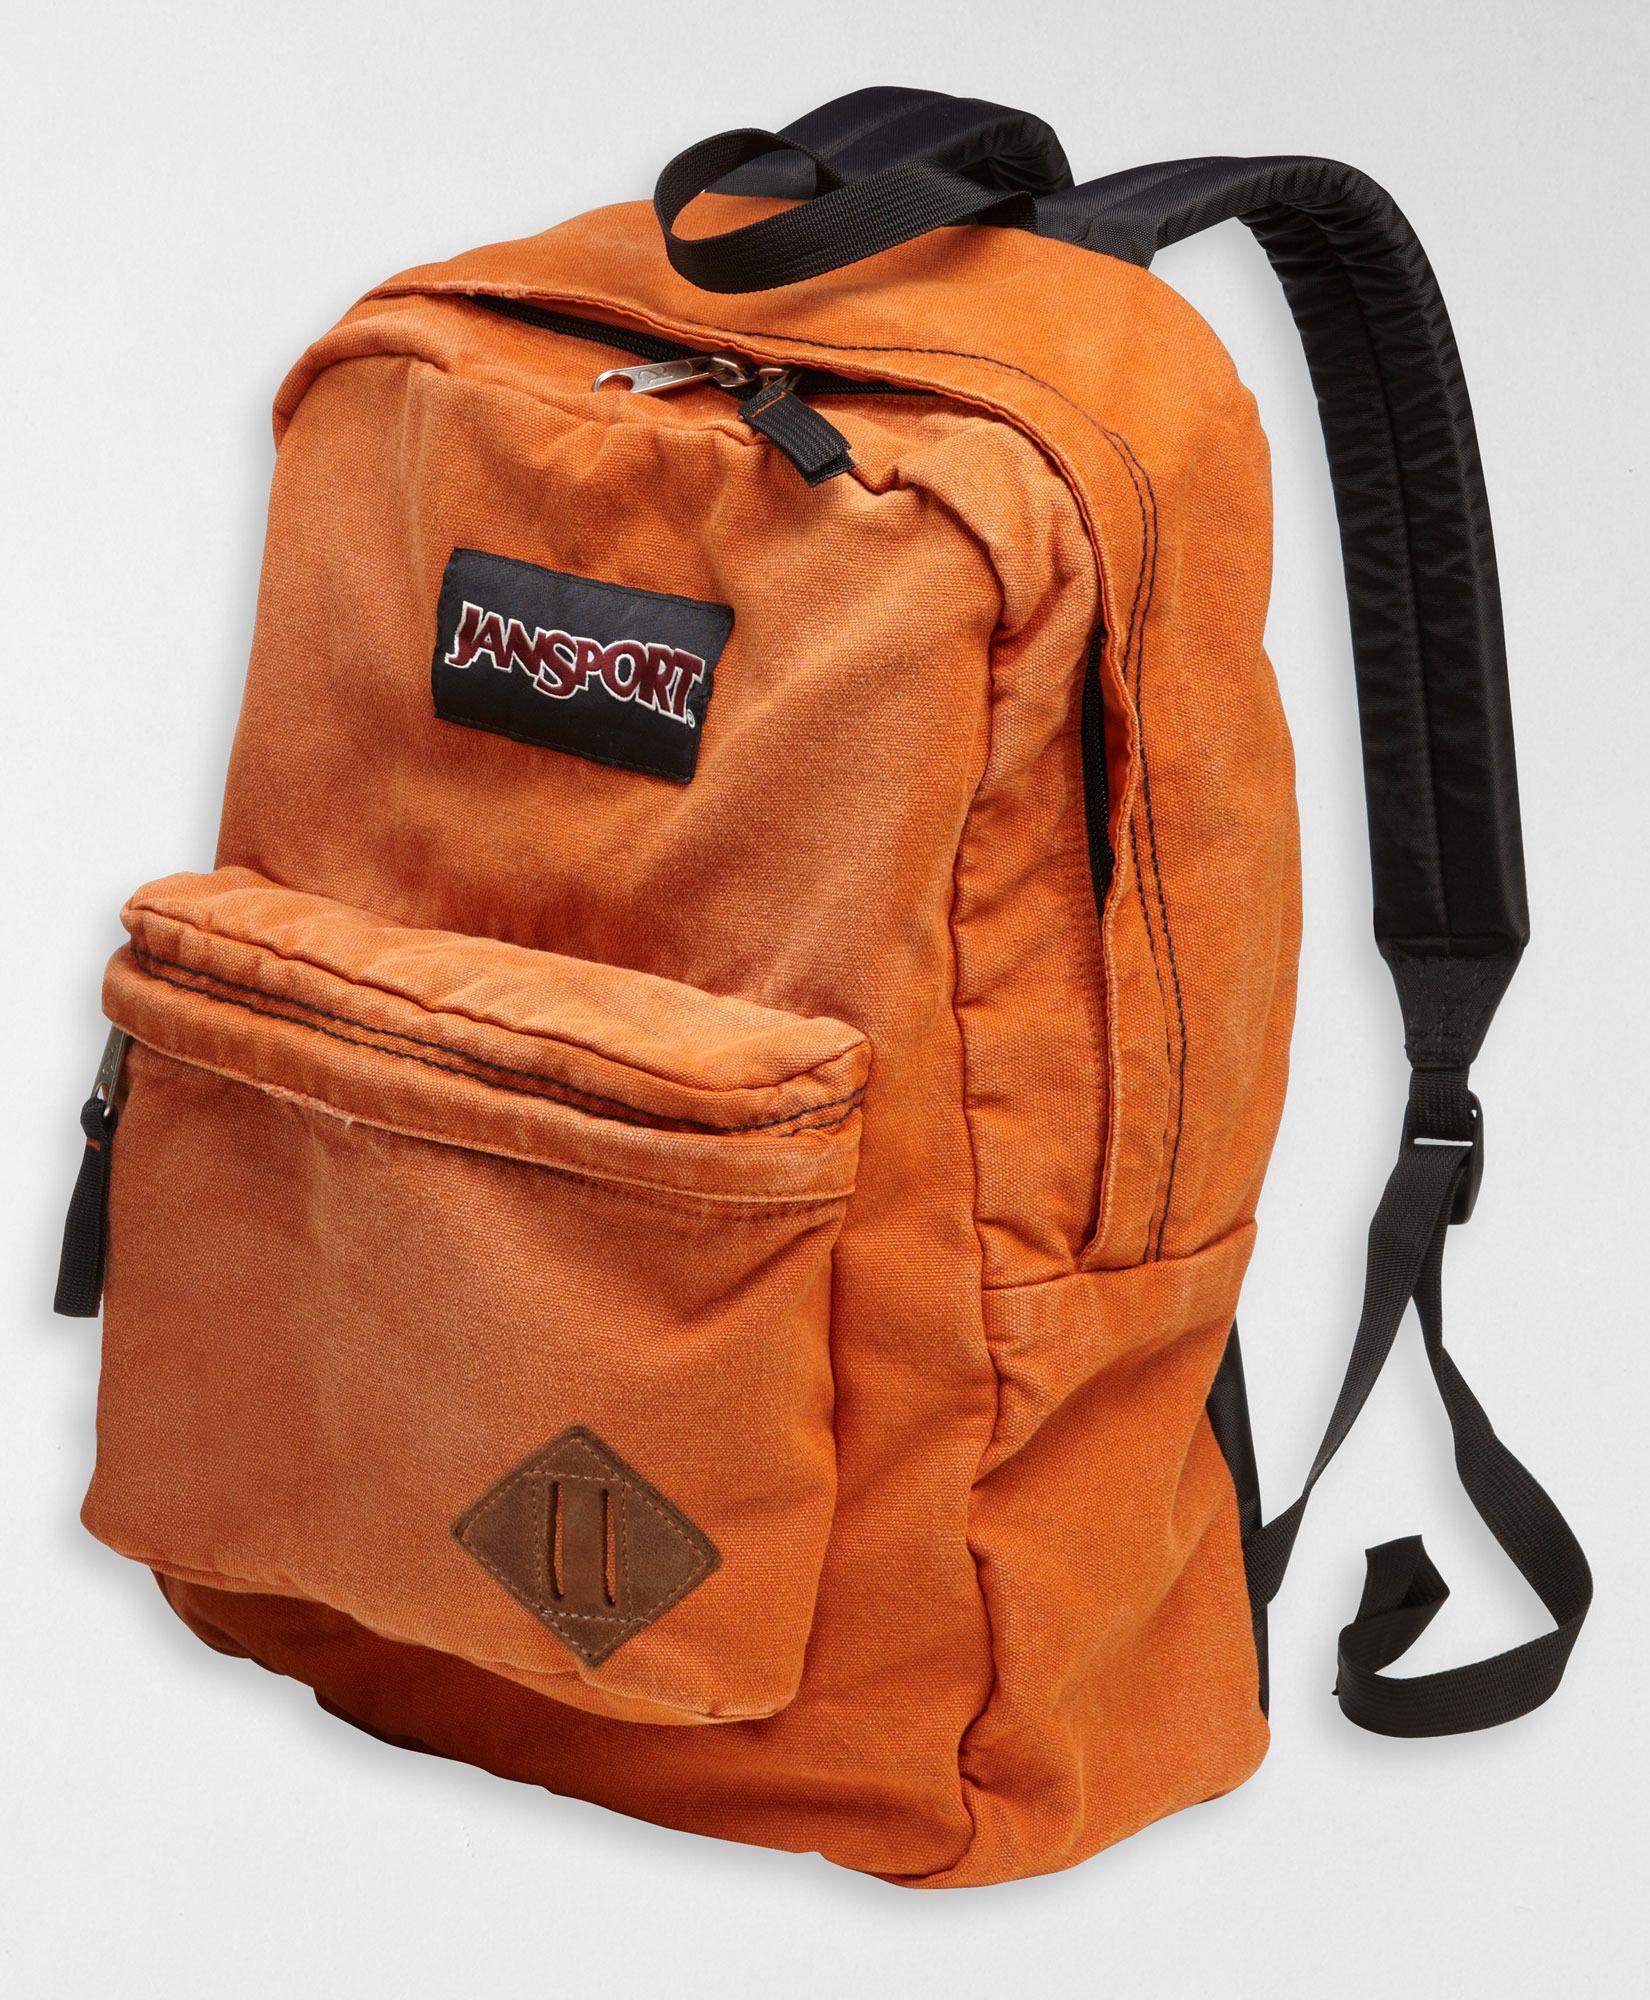 huge inventory 2a27a 9311b Levi s Jansport Backpack - Orange. Yes please!!!